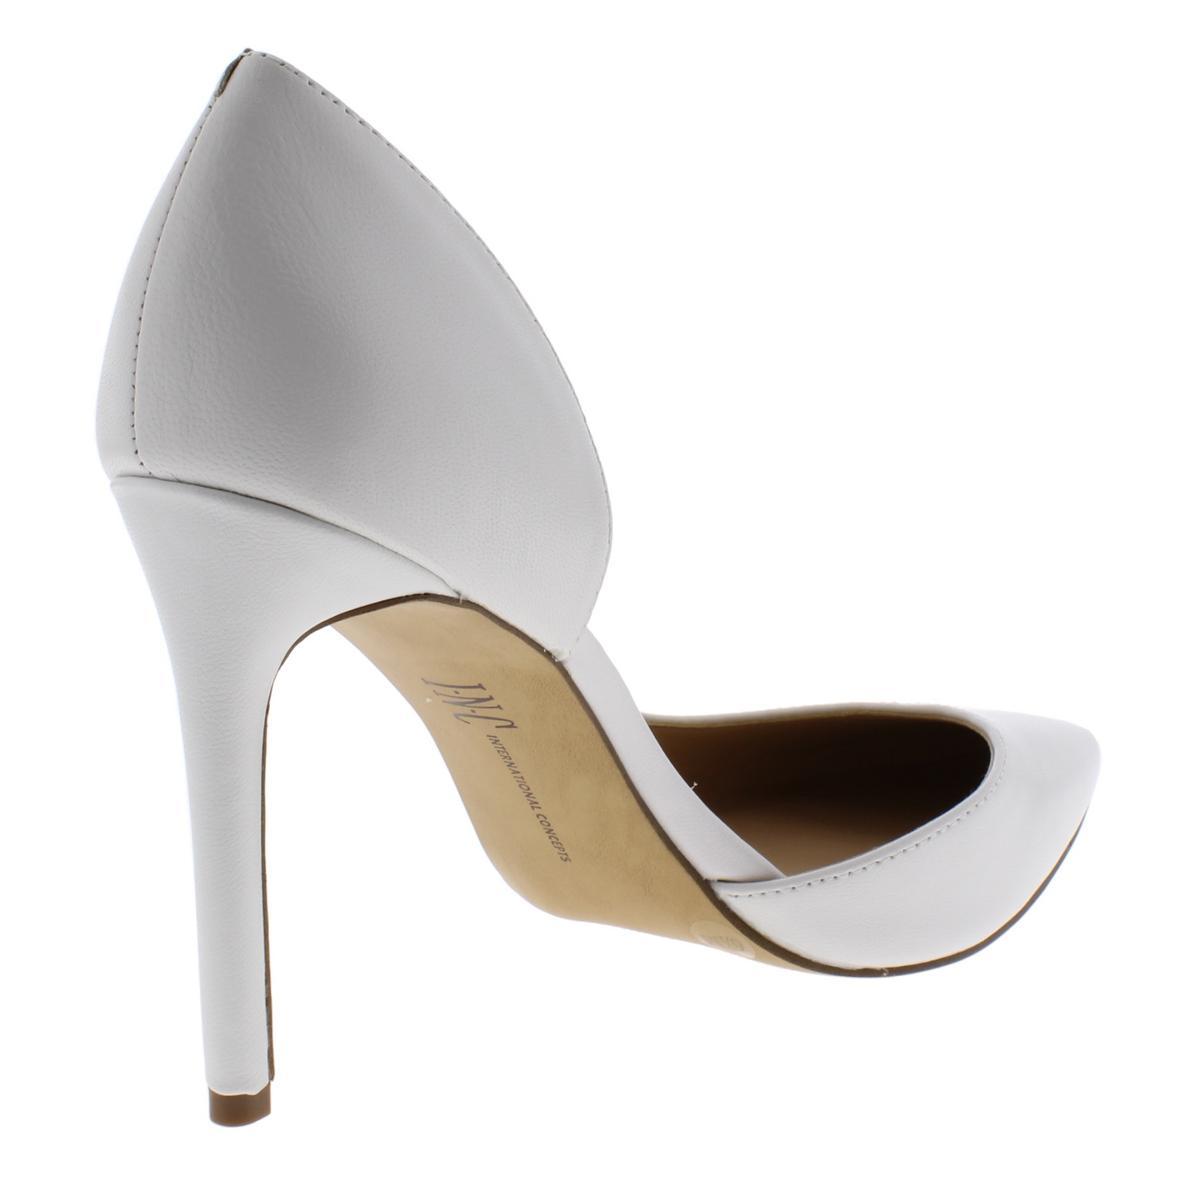 INC-Womens-Kenjay-Padded-Insole-Stiletto-Dress-D-039-Orsay-Heels-Shoes-BHFO-7446 thumbnail 6